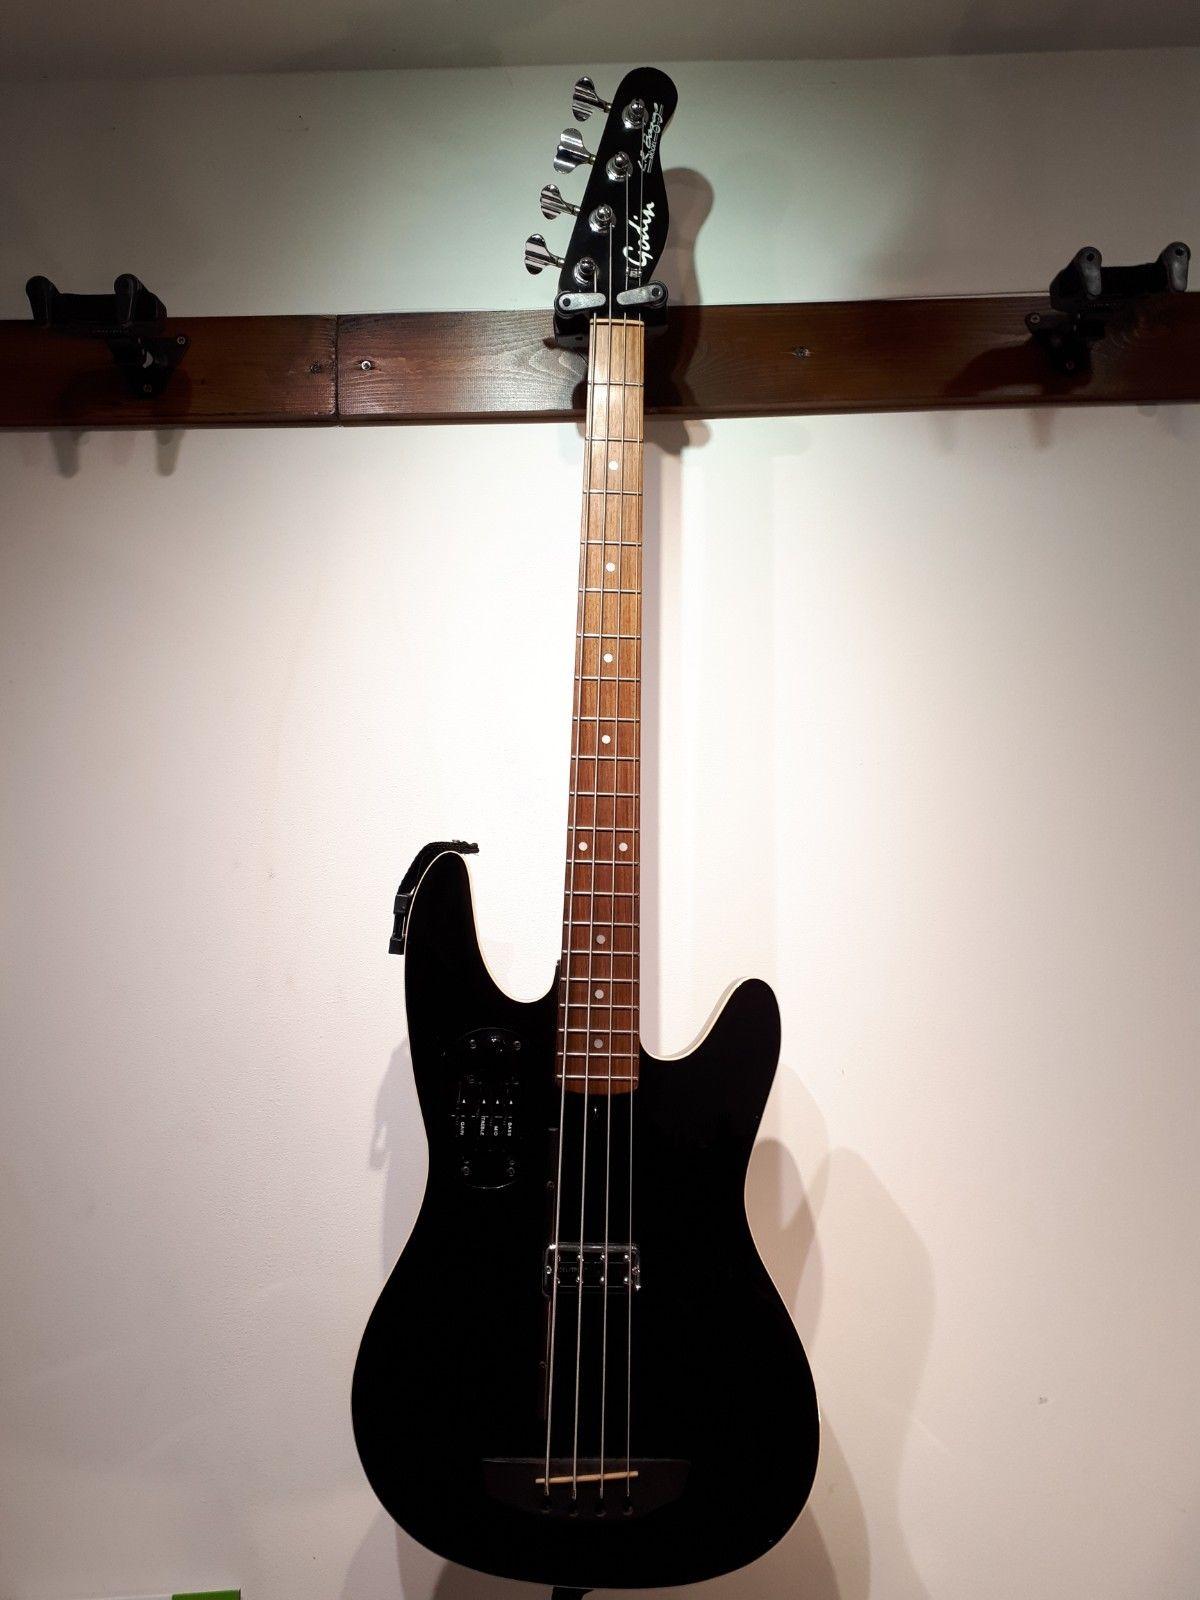 godin a4 lr baggs electric acoustic lightweight hybrid bass hard case modded guitar mania. Black Bedroom Furniture Sets. Home Design Ideas